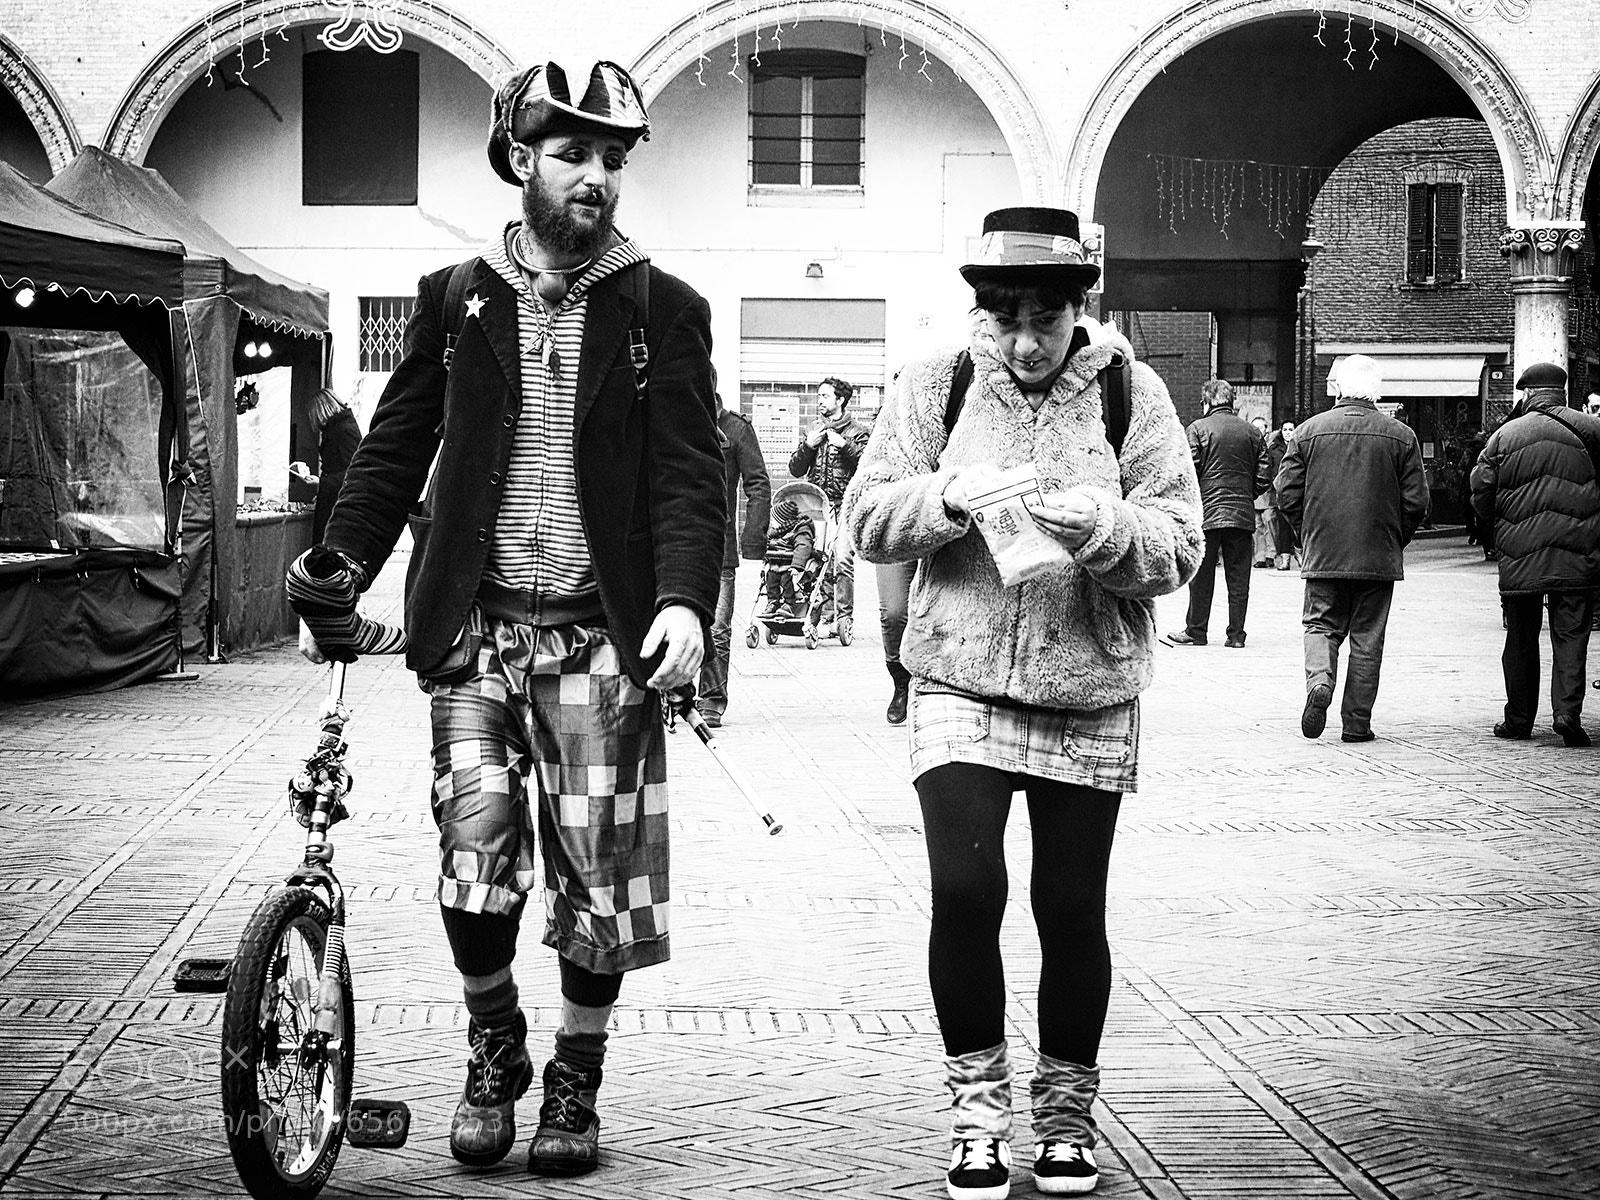 Photograph clown by Stella Trasforini on 500px